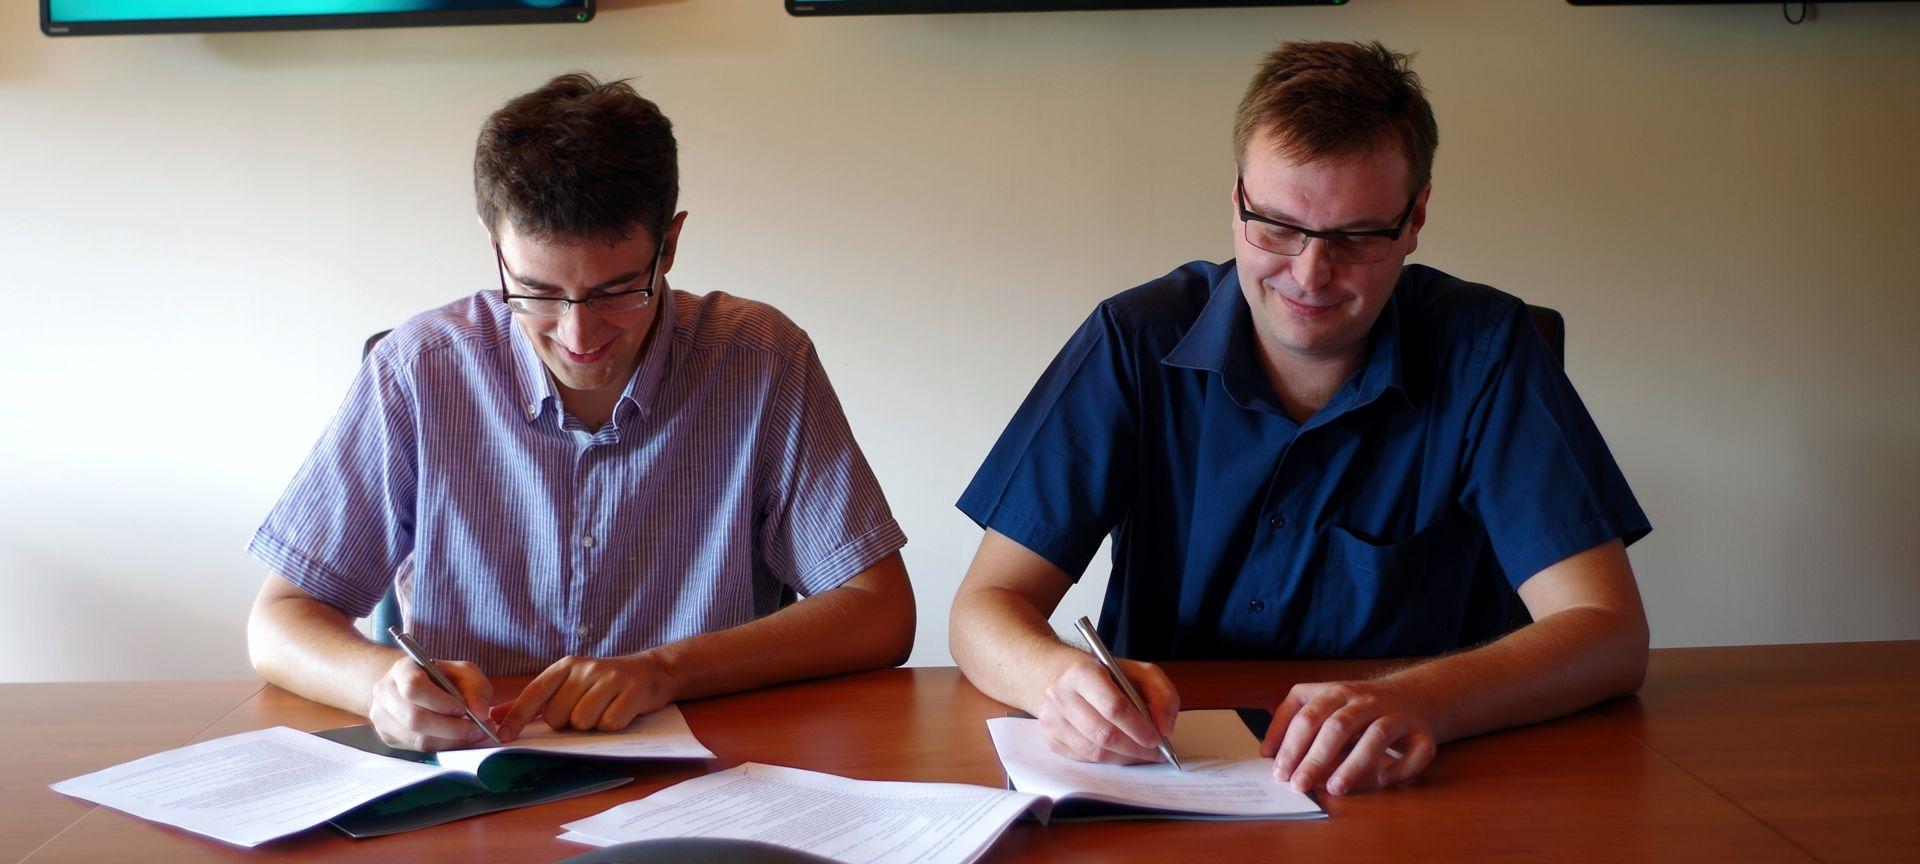 ABBA d.o.o. i GAUSS d.o.o. potpisali Ugovor o poslovno-tehničkoj suradnji